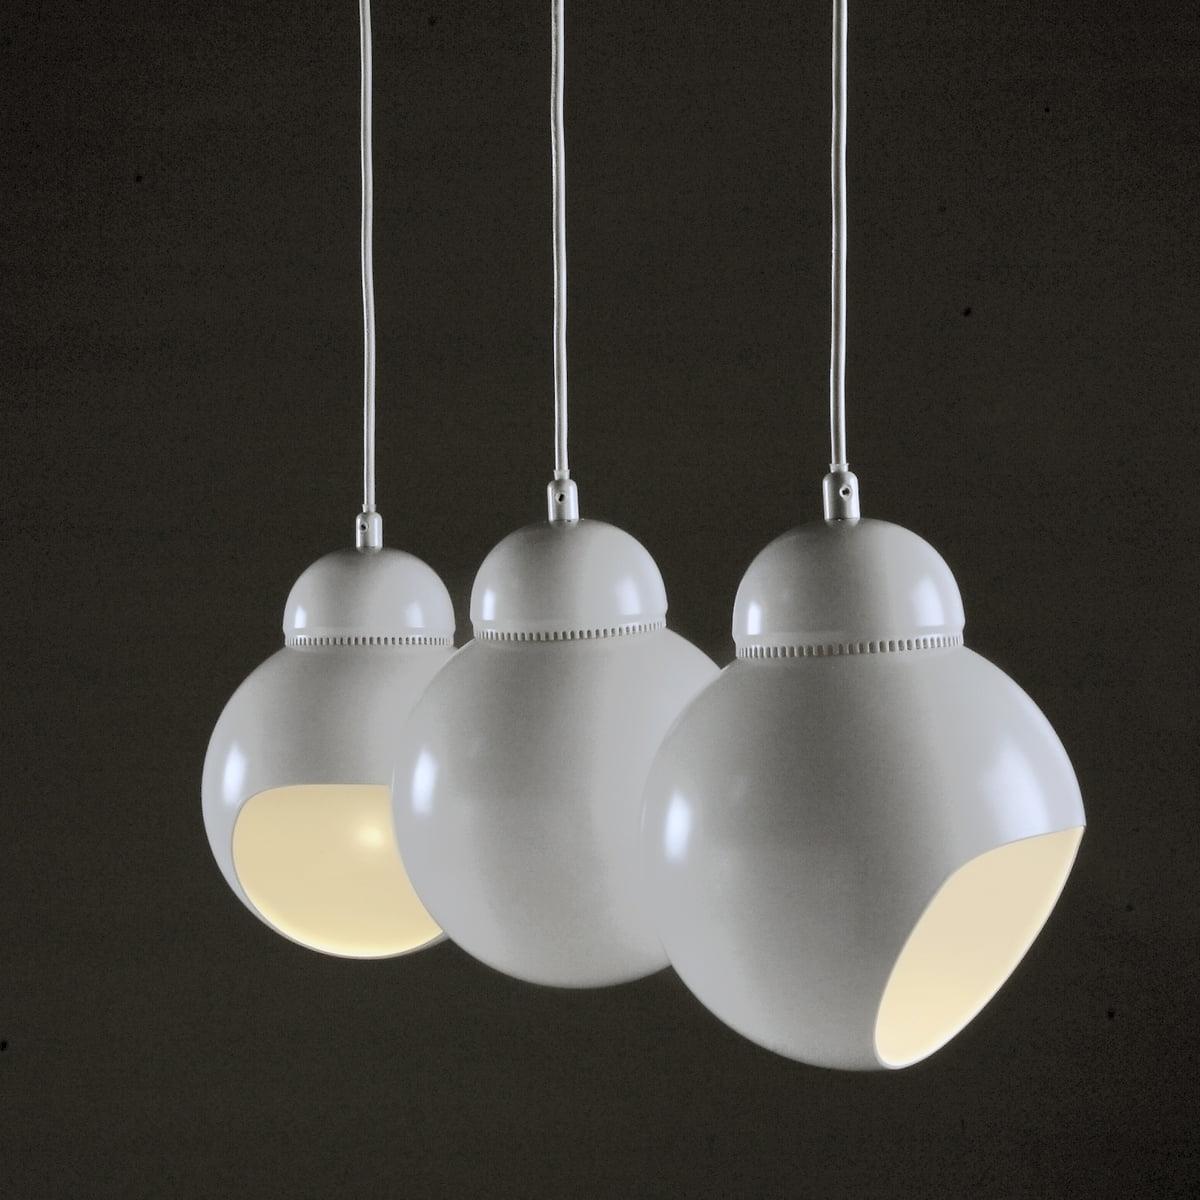 Artek products lighting pendant light a338 - Artek A 338 Bilberry Pendant White